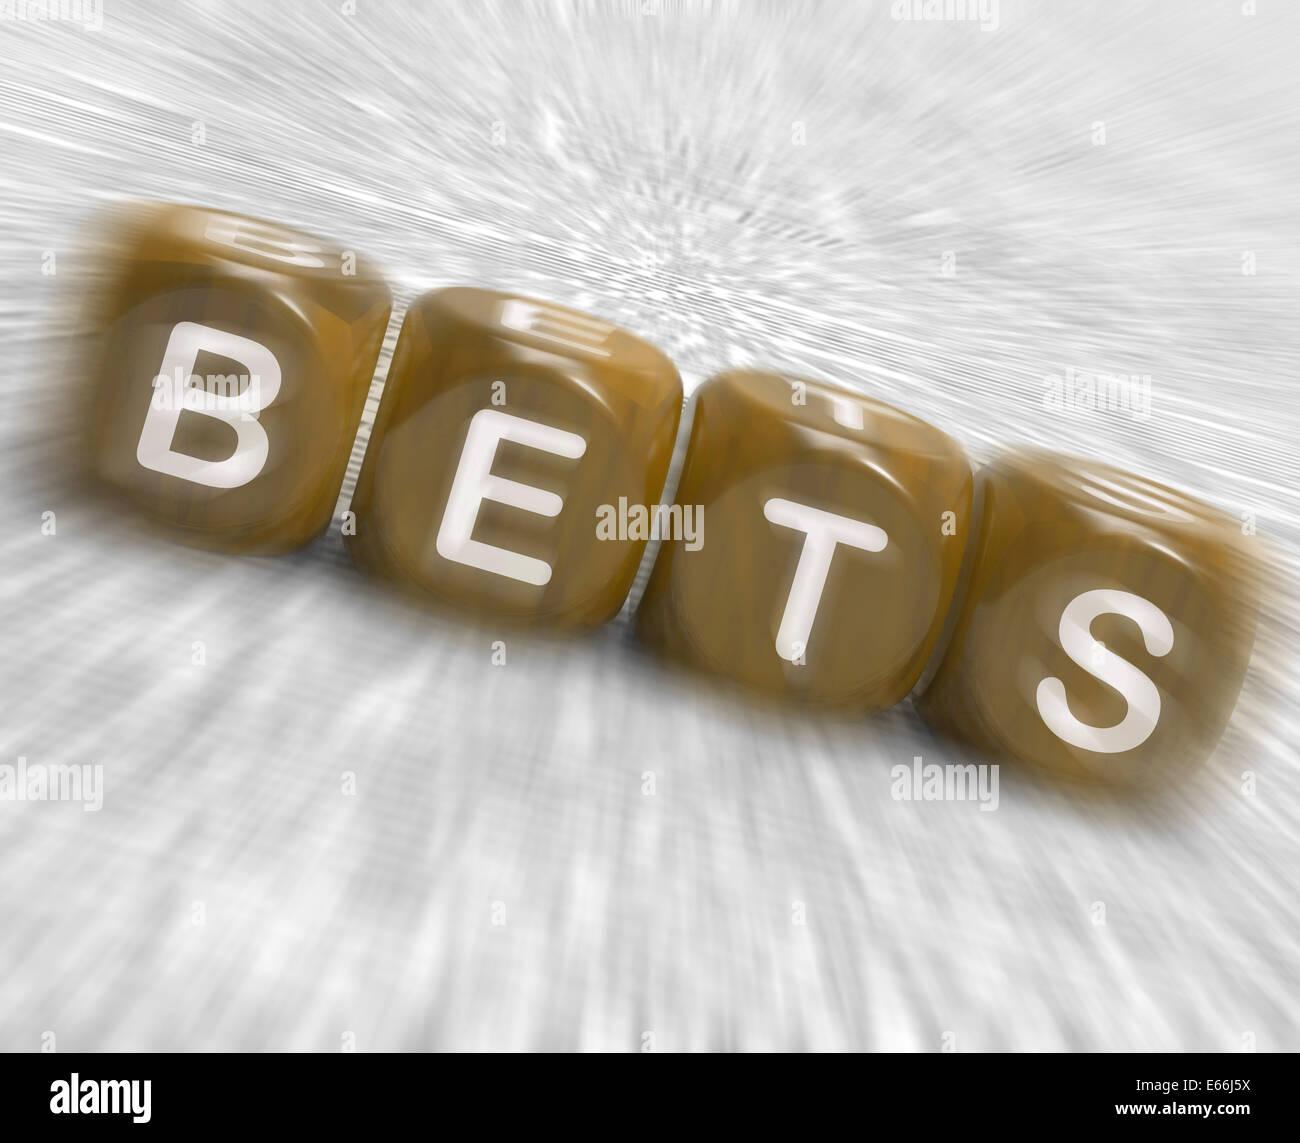 Bets Dice Displaying Gambling Chance Or Sweep Stake - Stock Image